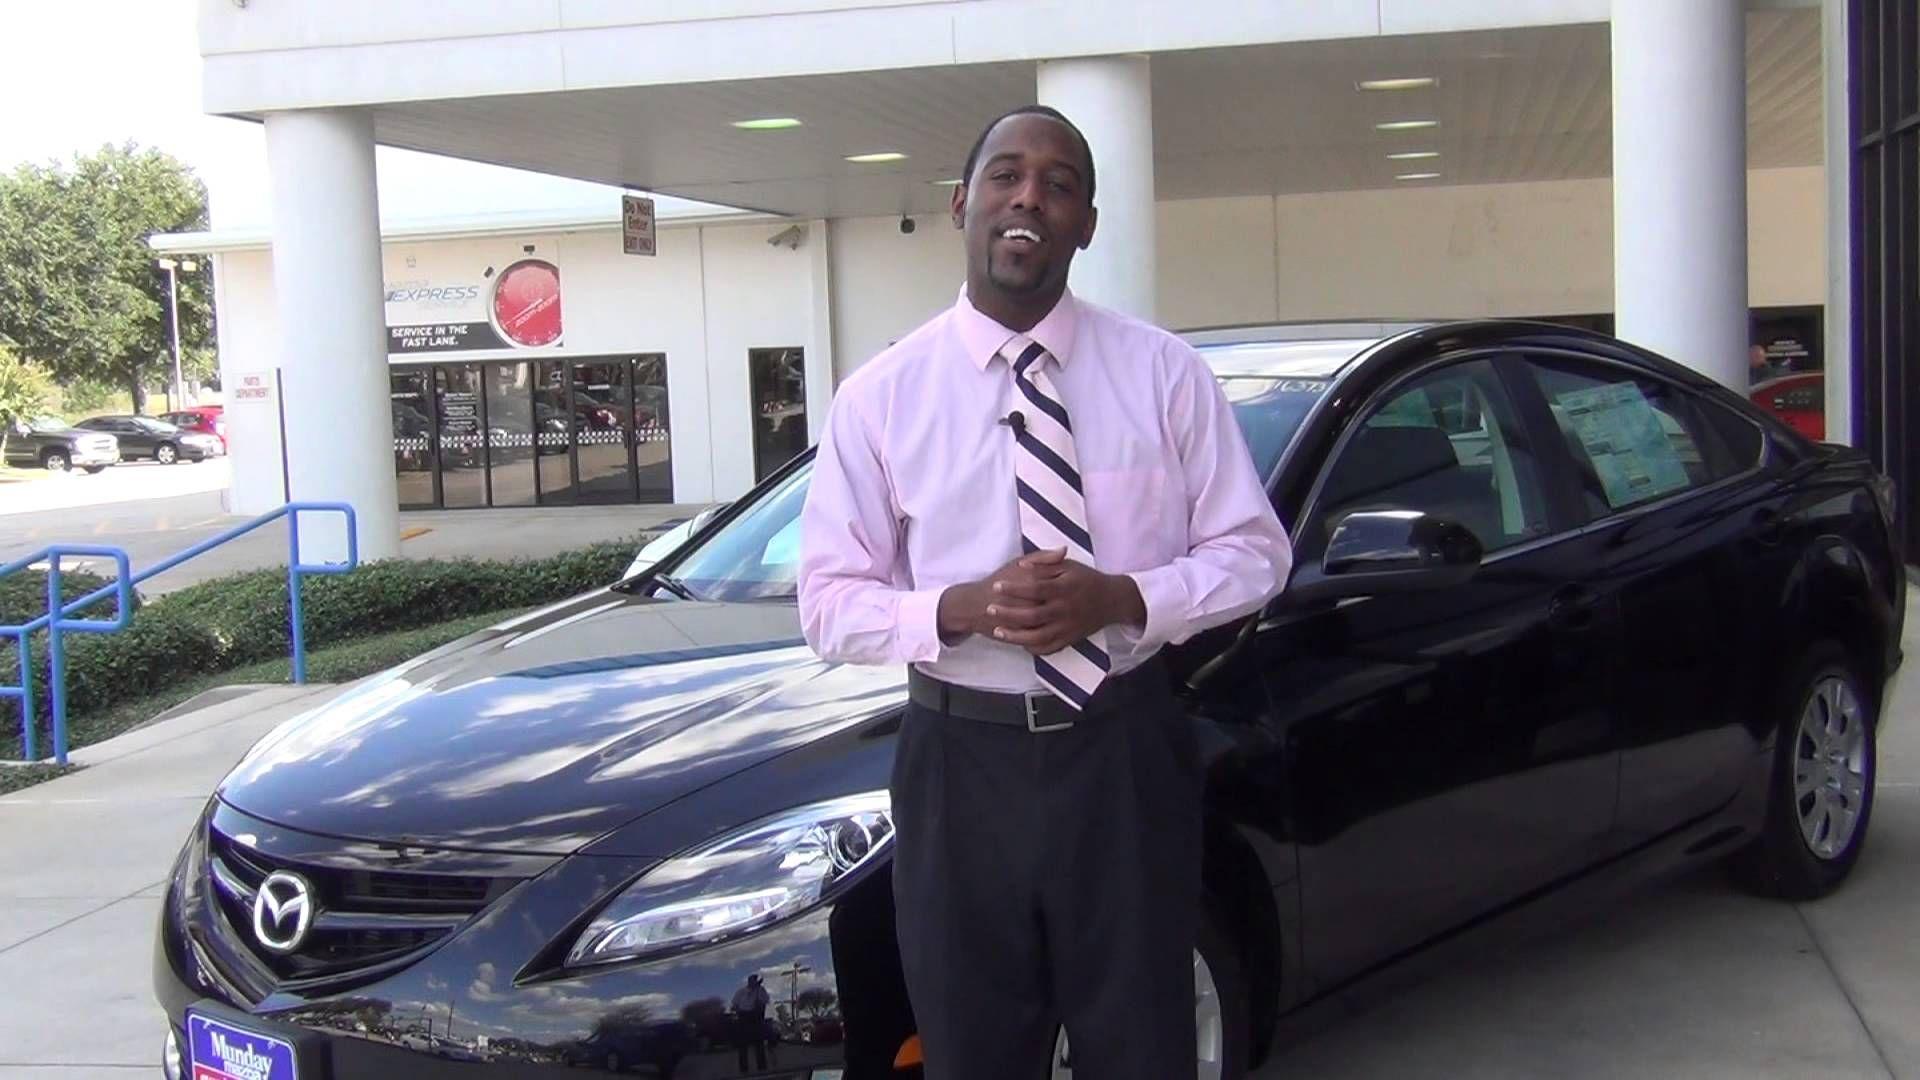 Houston Tx 2014 Mazda Cx 5 Dealer Prices Spring Tx 2014 Mazda3 For Sale Specials Humble Tx Jersey Village Mazda Mazda Cx 9